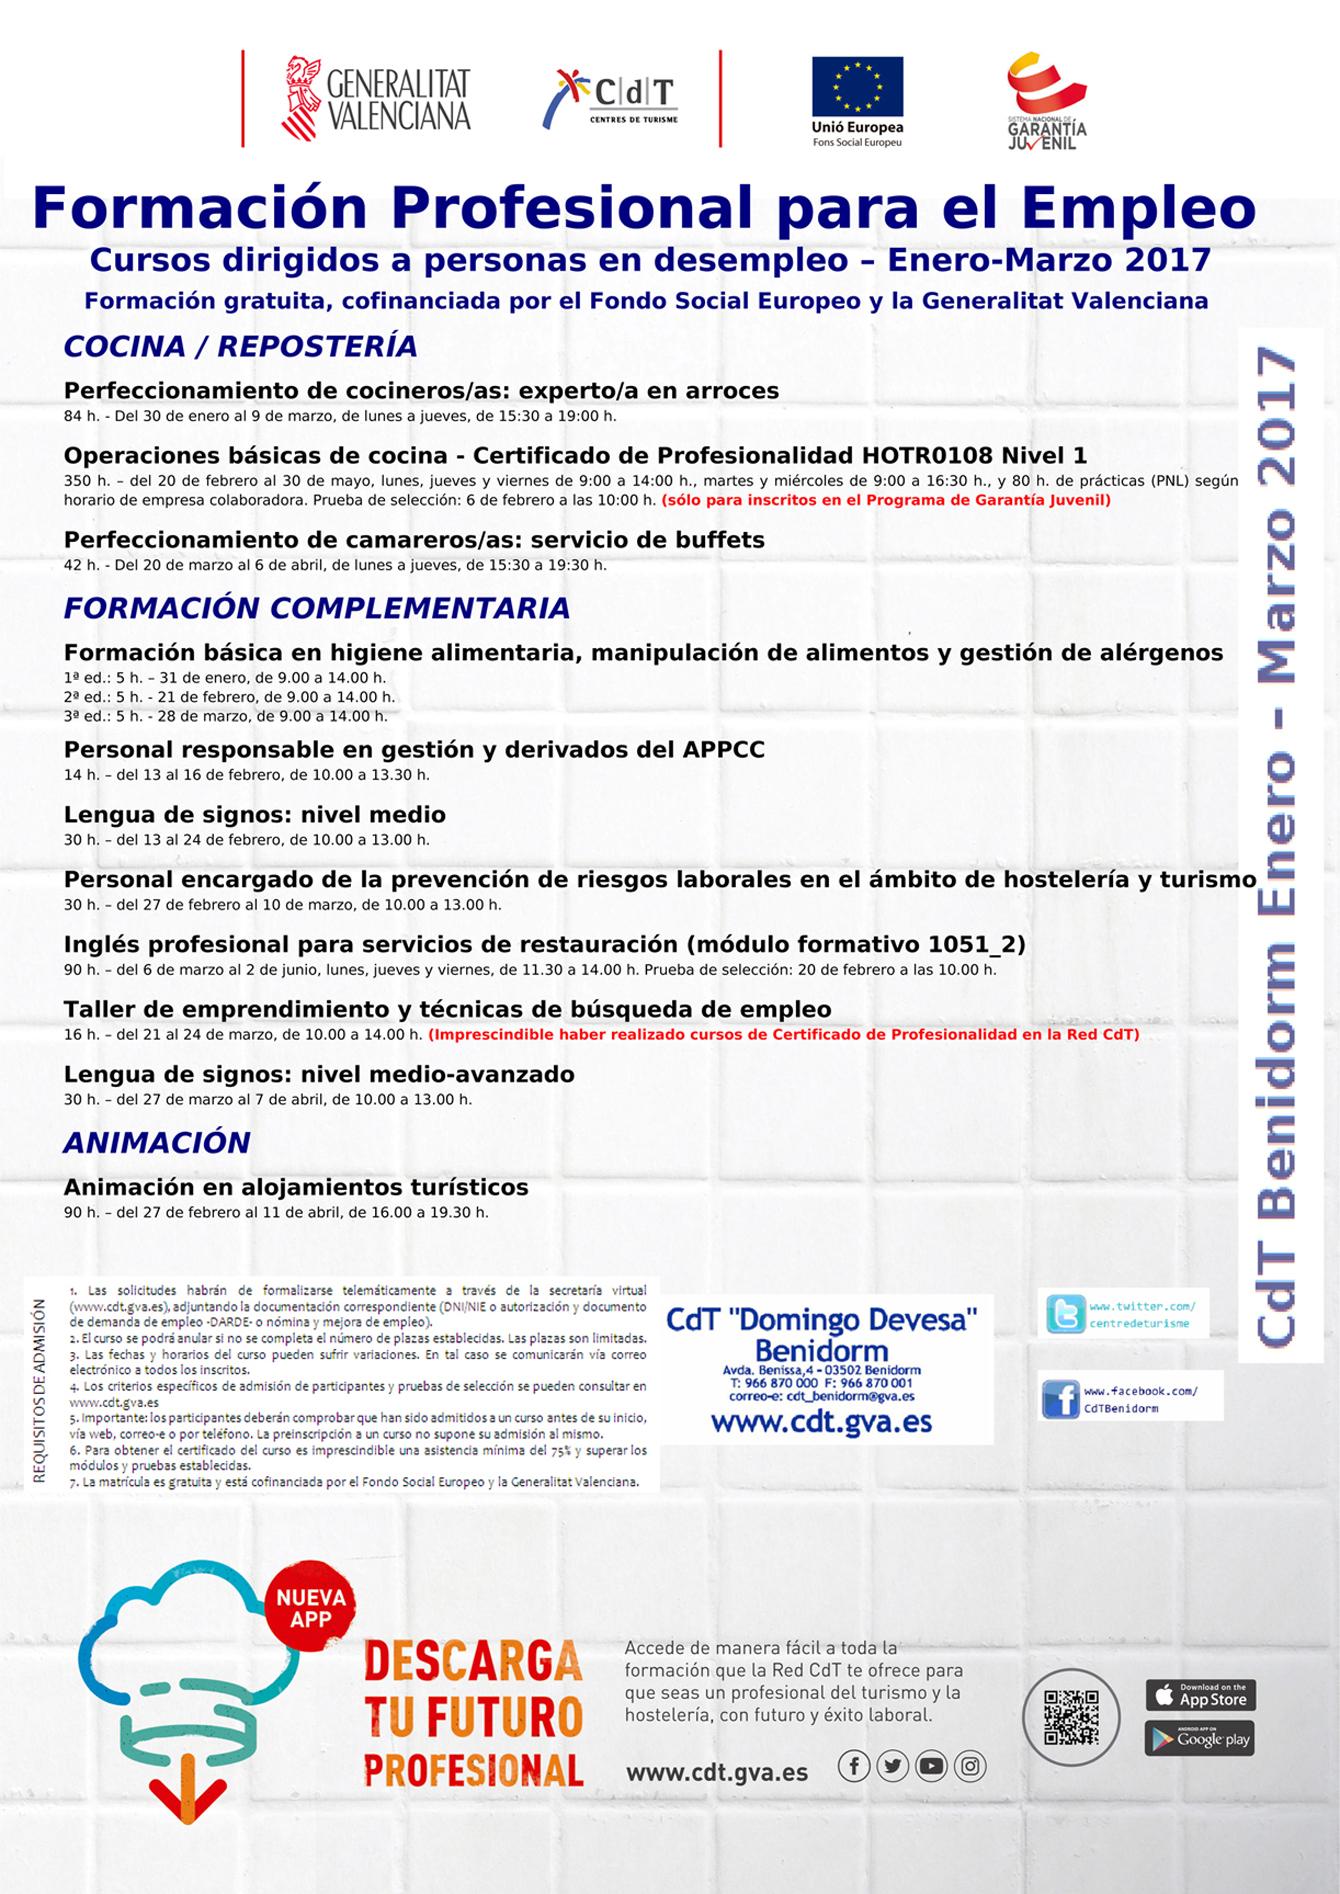 Microsoft Word - Cursos FO 1trim2017_A3_castellano.docx